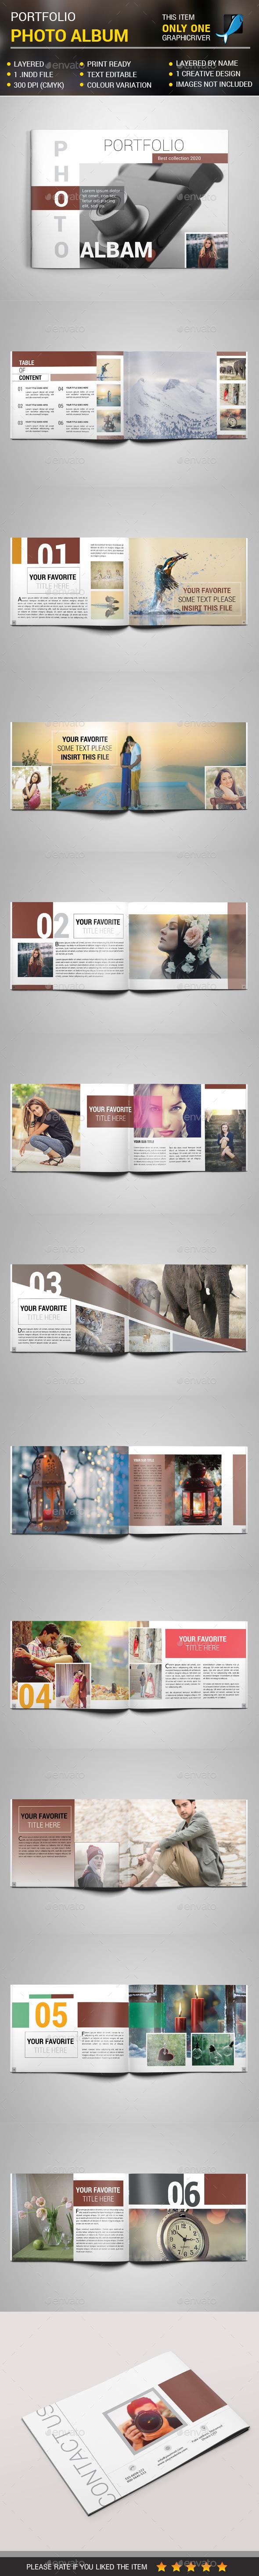 Portfolio Photo Album - Photo Albums Print Templates